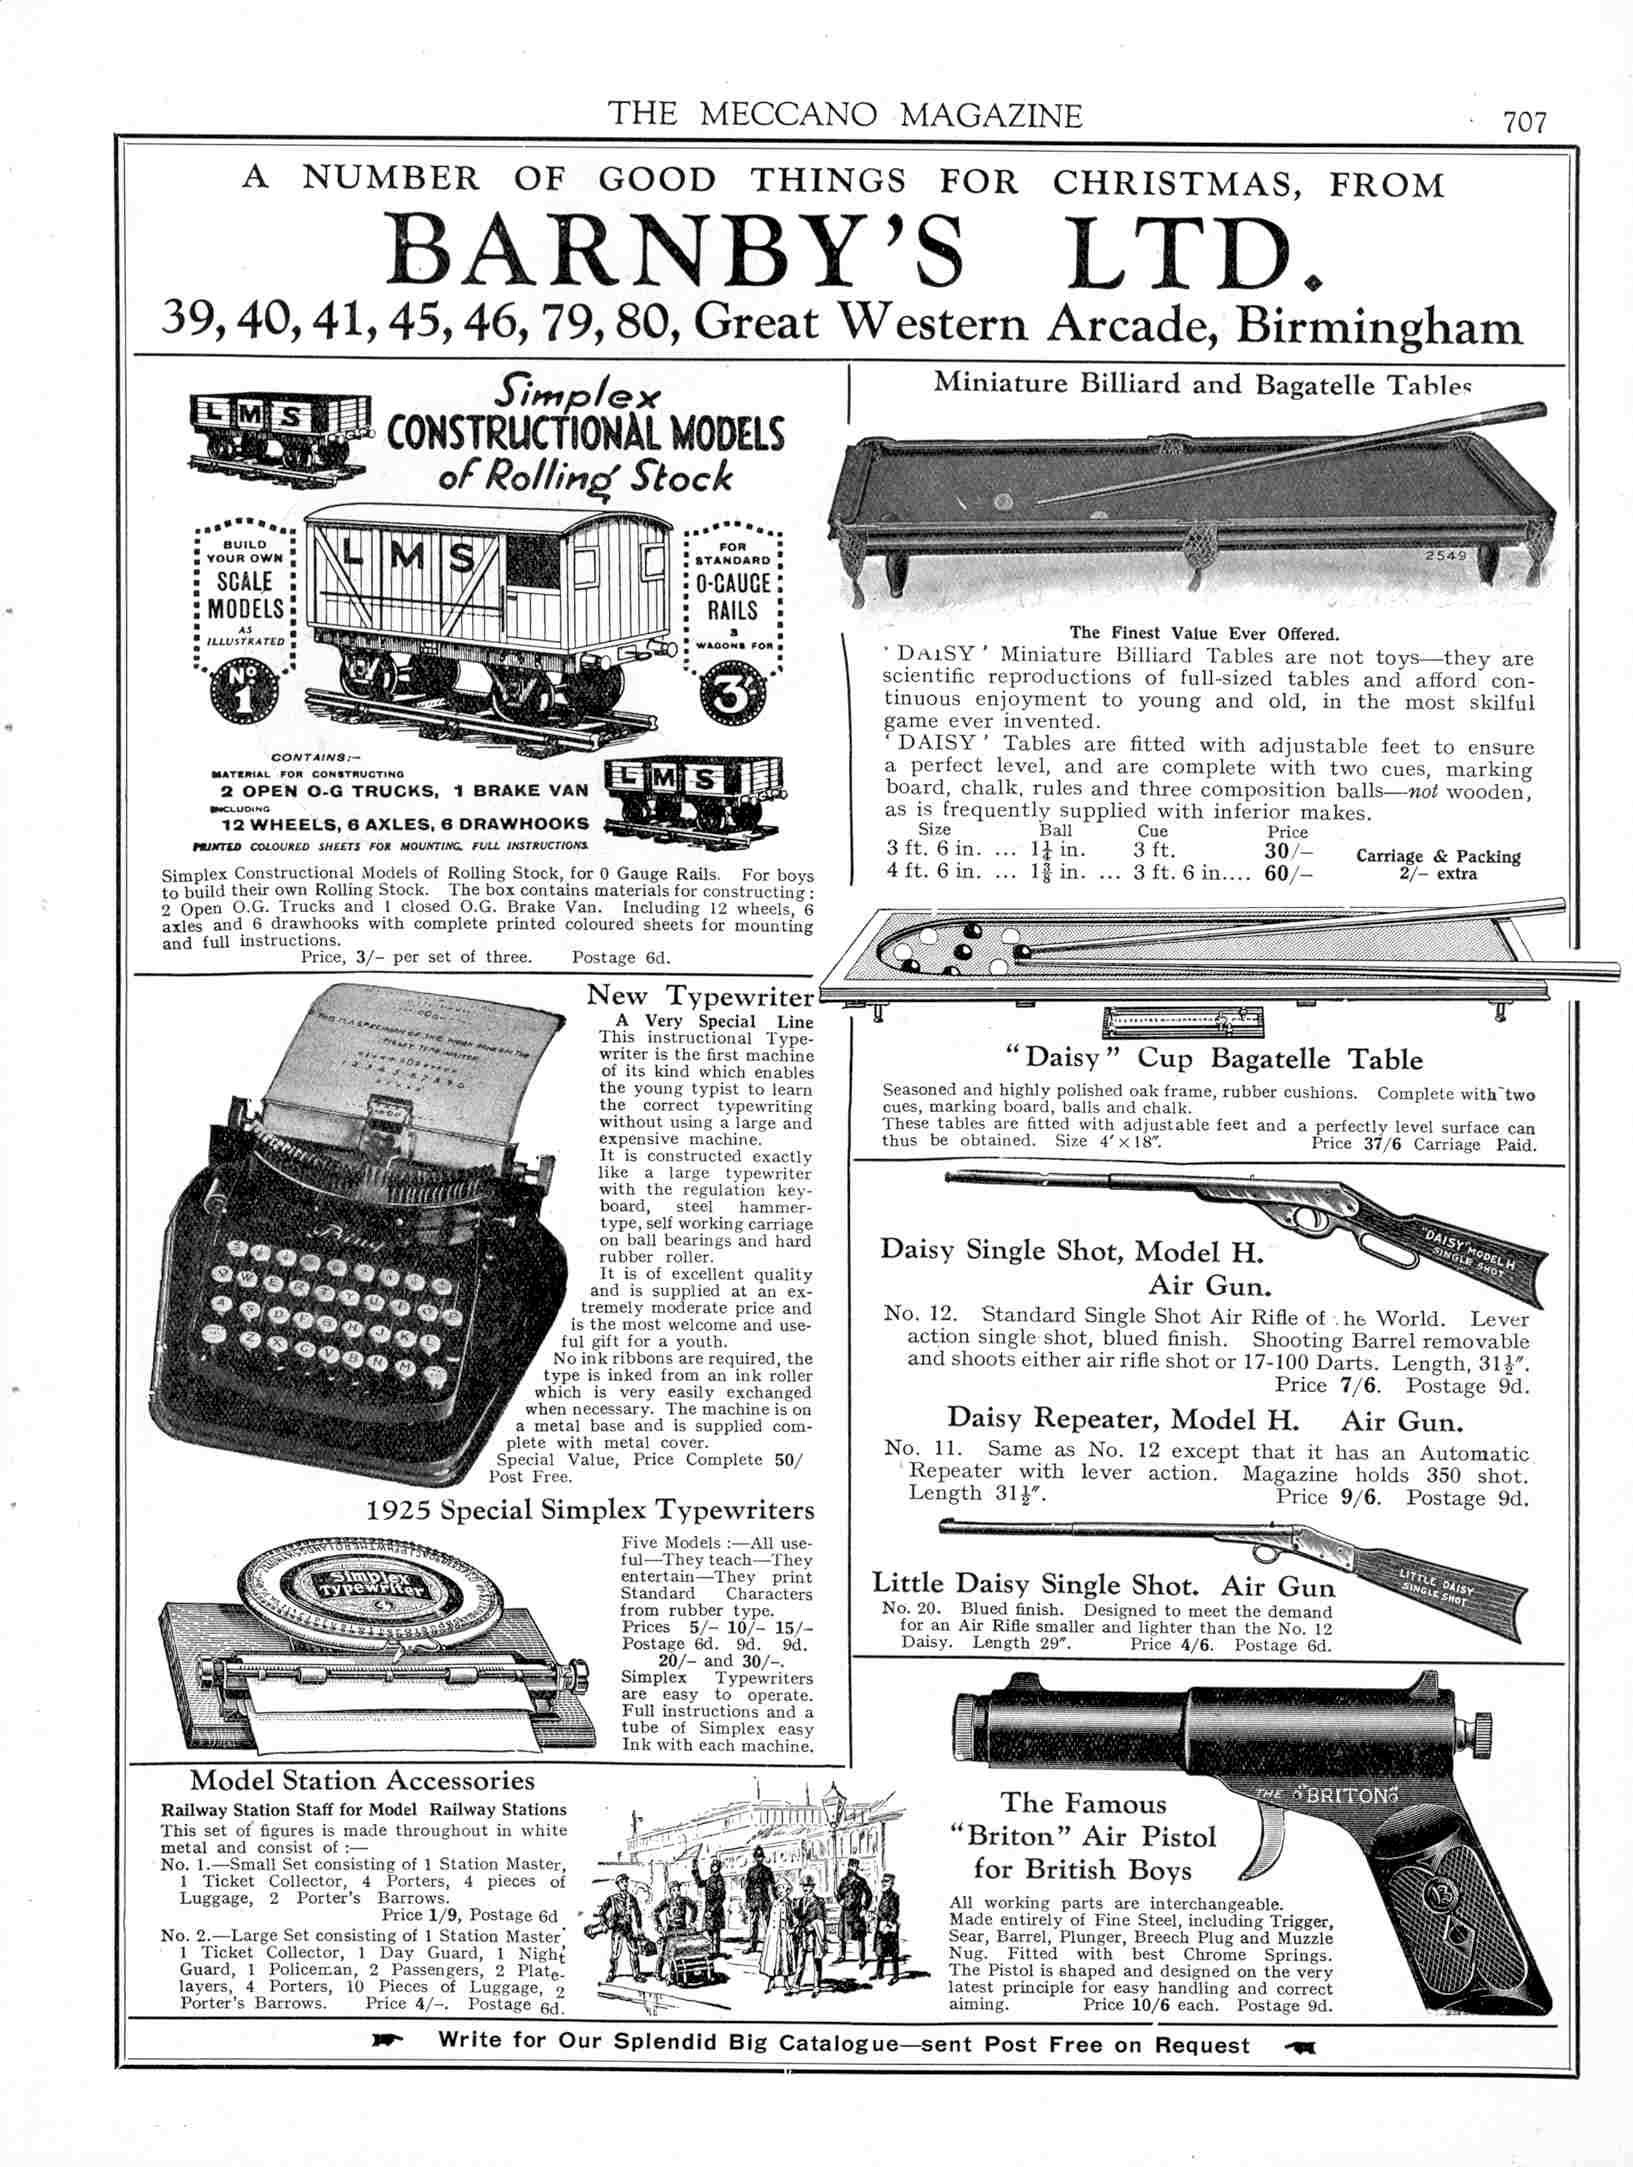 UK Meccano Magazine December 1925 Page 707